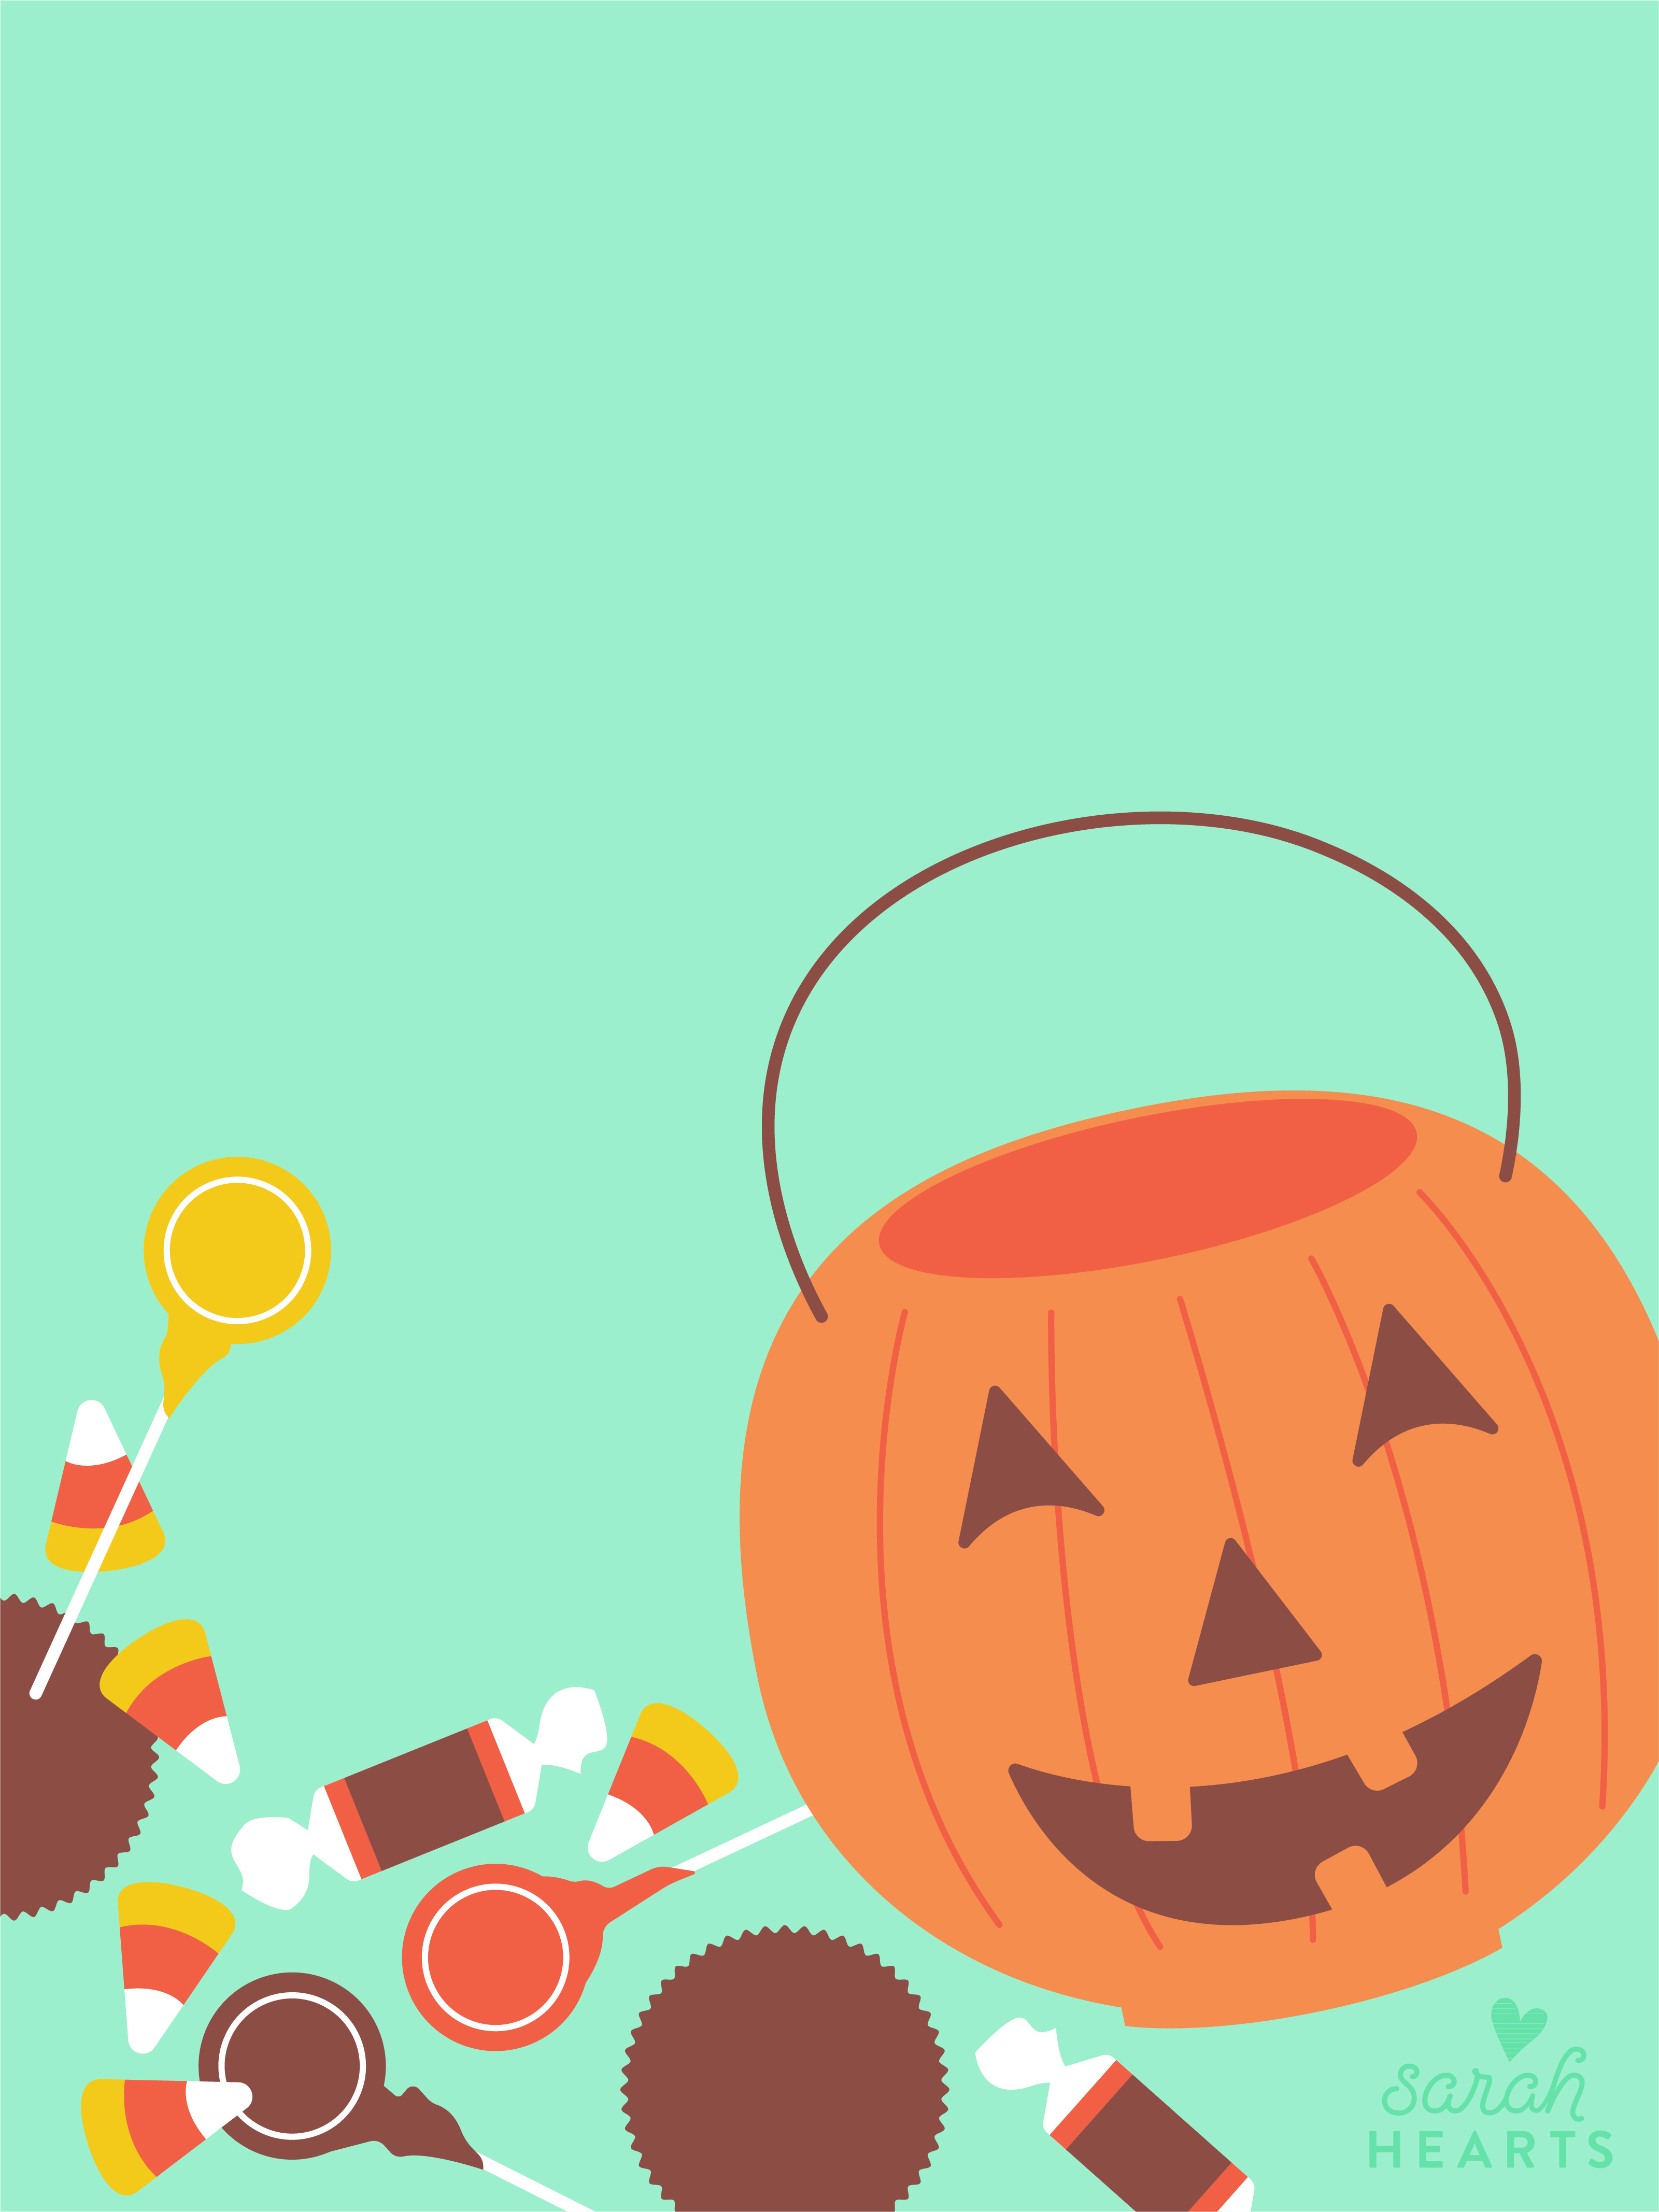 October 2018 Halloween Candy Calendar Wallpaper Sarah Hearts